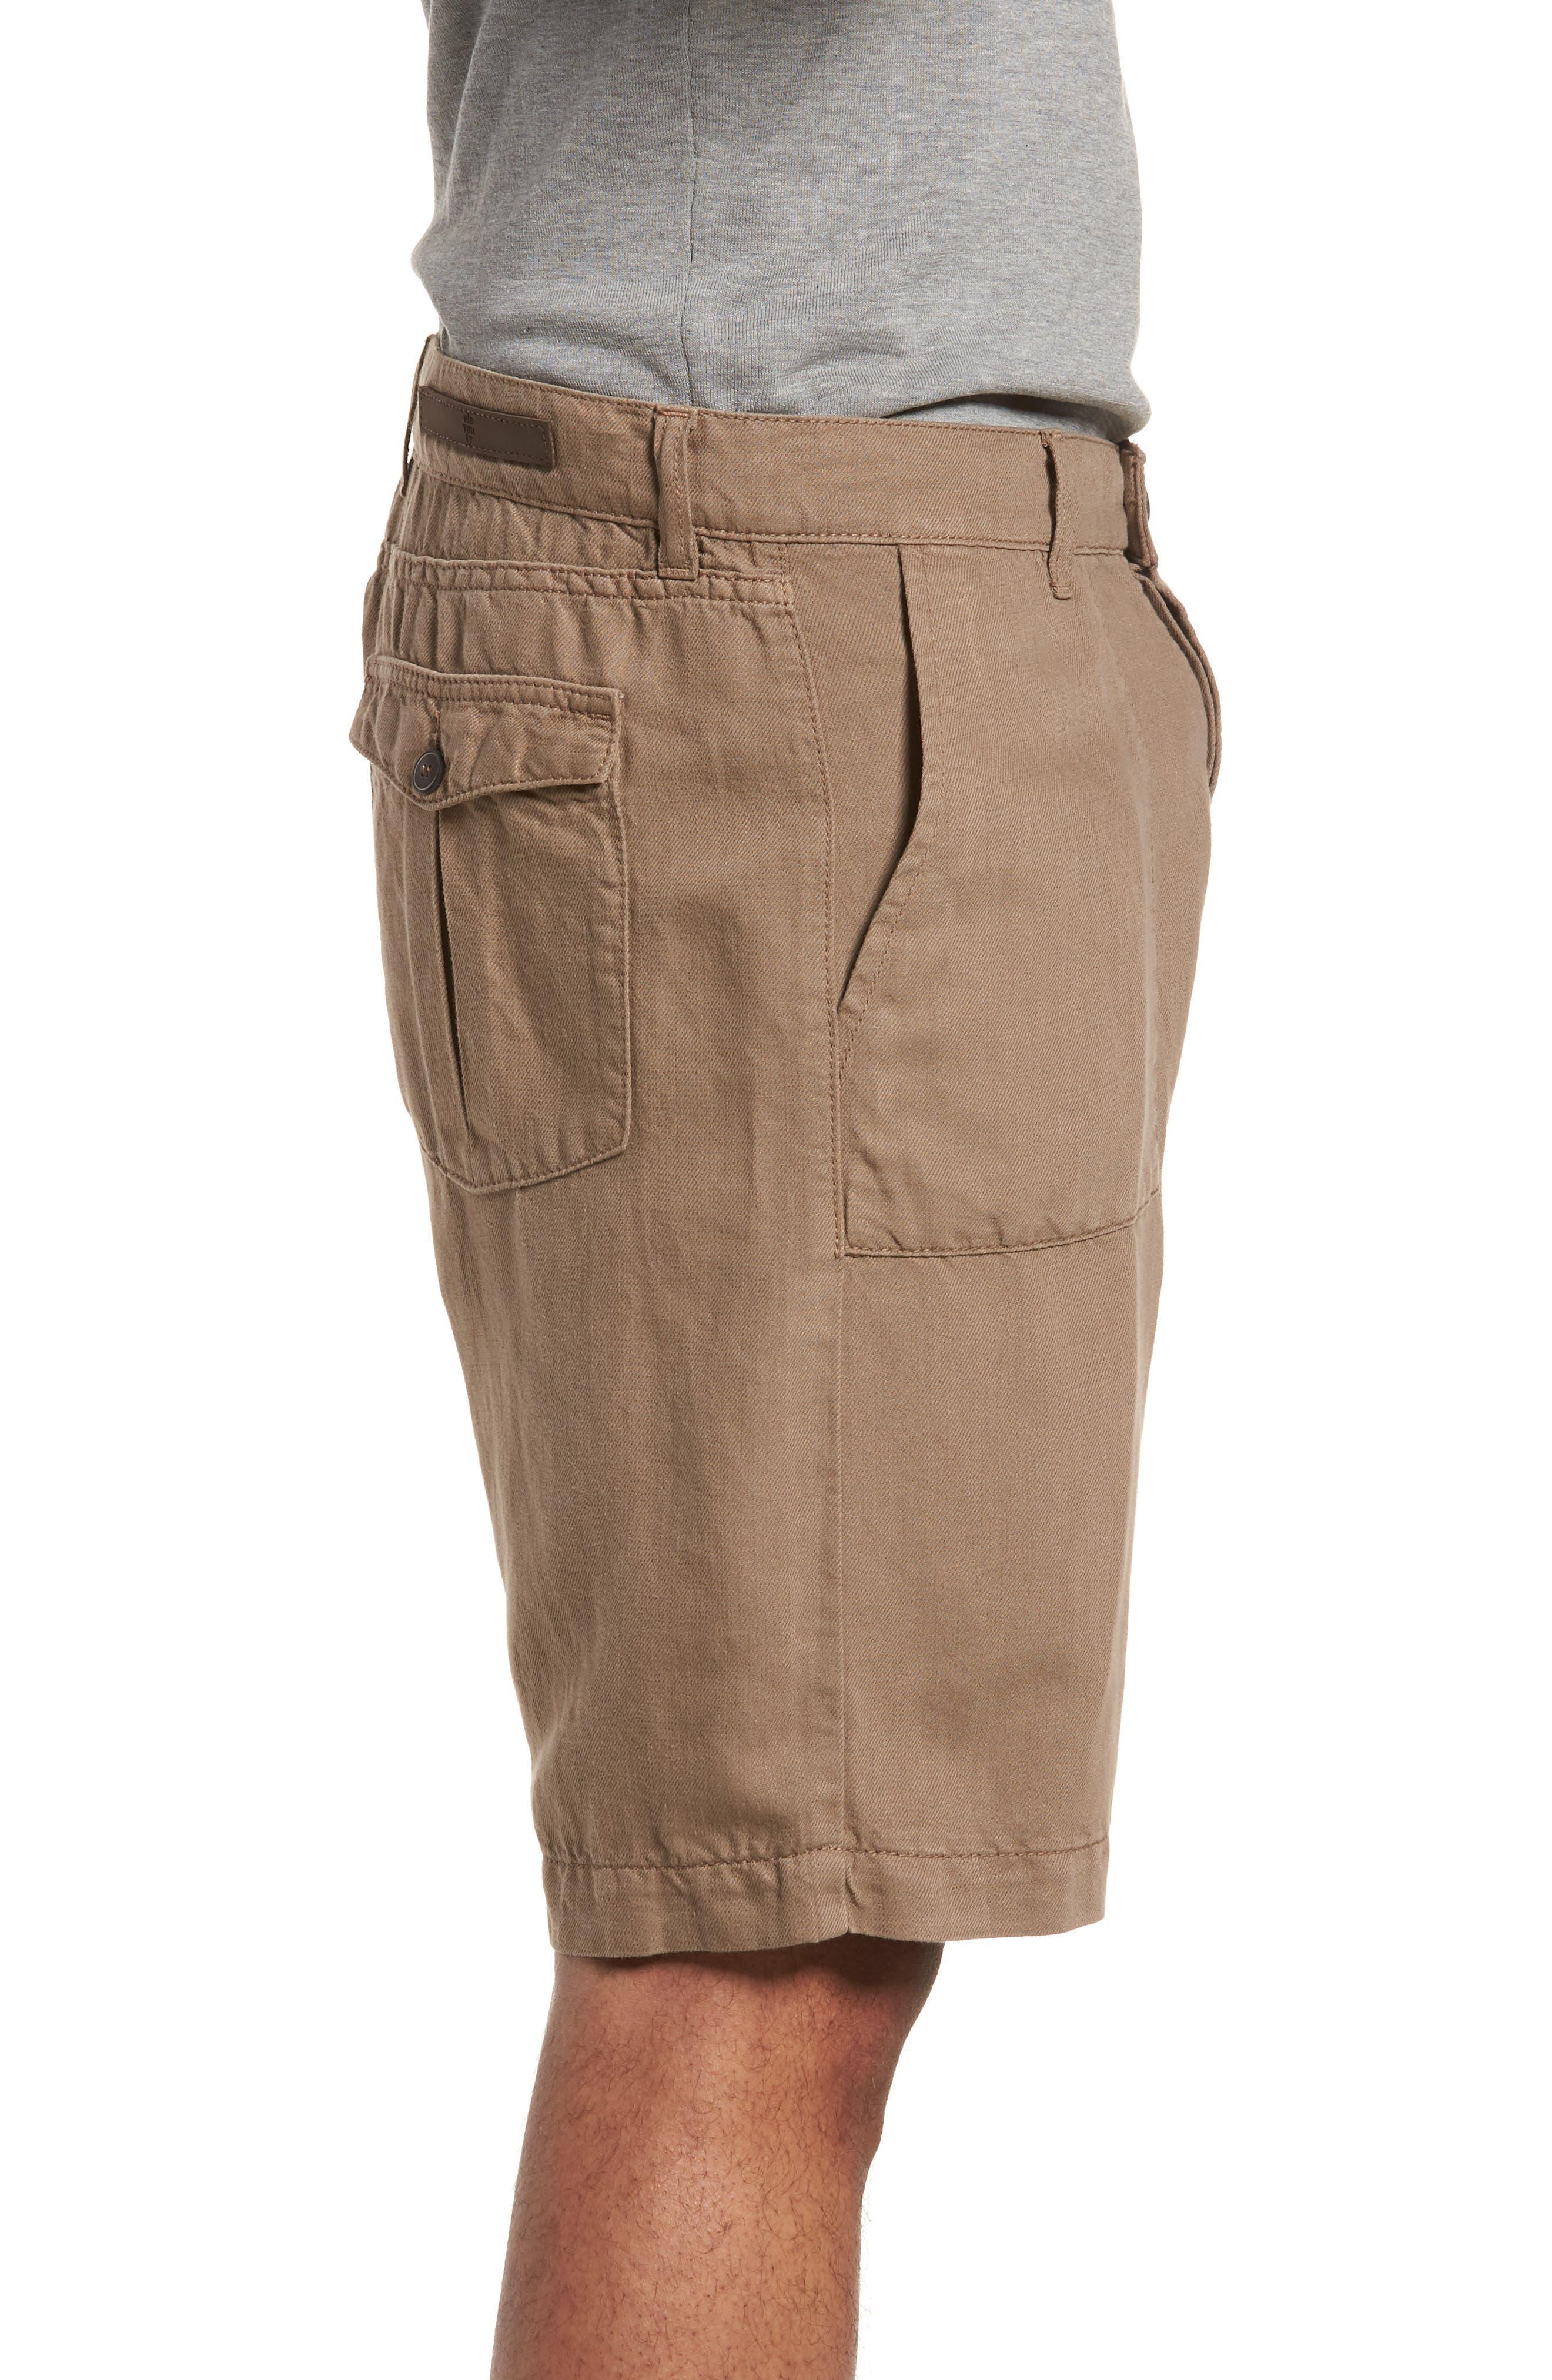 Fatique Bermuda Shorts,                             Alternate thumbnail 3, color,                             Taupe